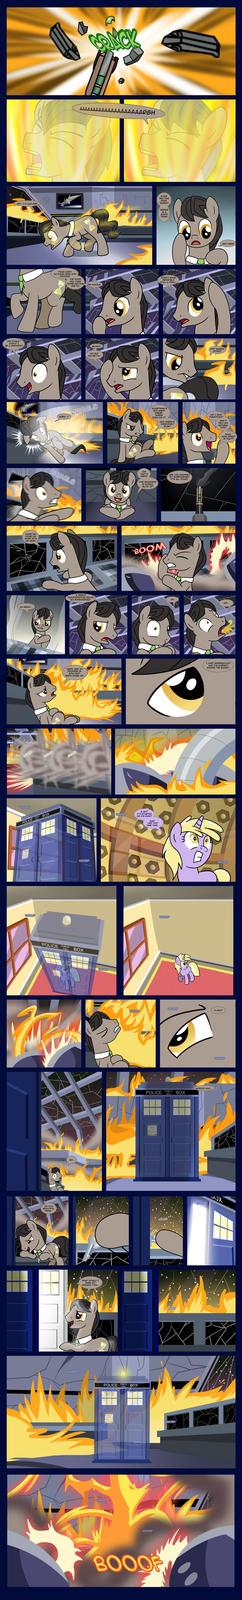 Doctor Whooves - Rebirth Pt 10